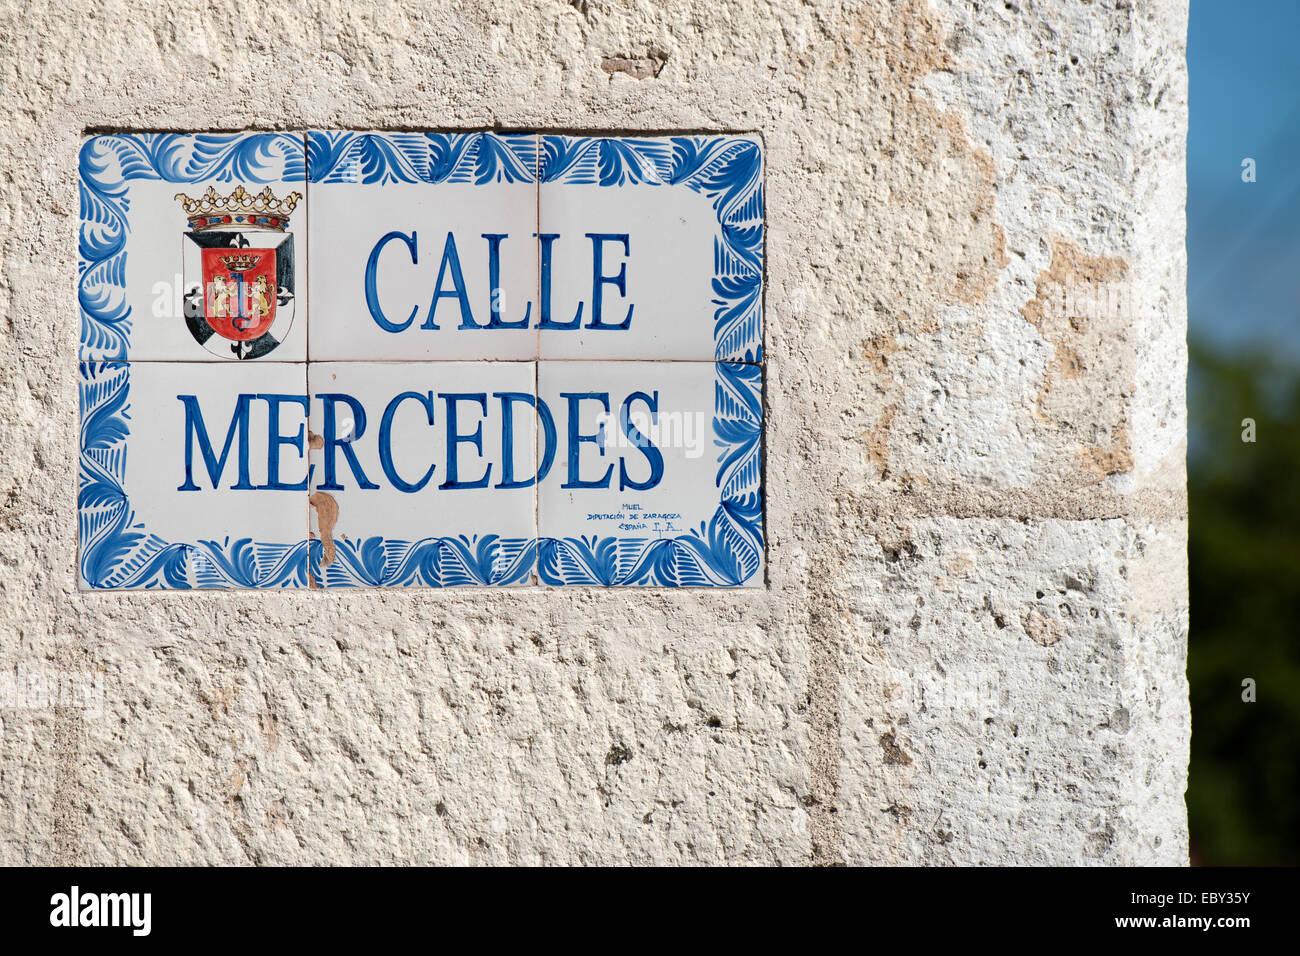 Dominikanische Republik, Santo Domingo, Zona Colonial, Calle Mercedes - Stock Image